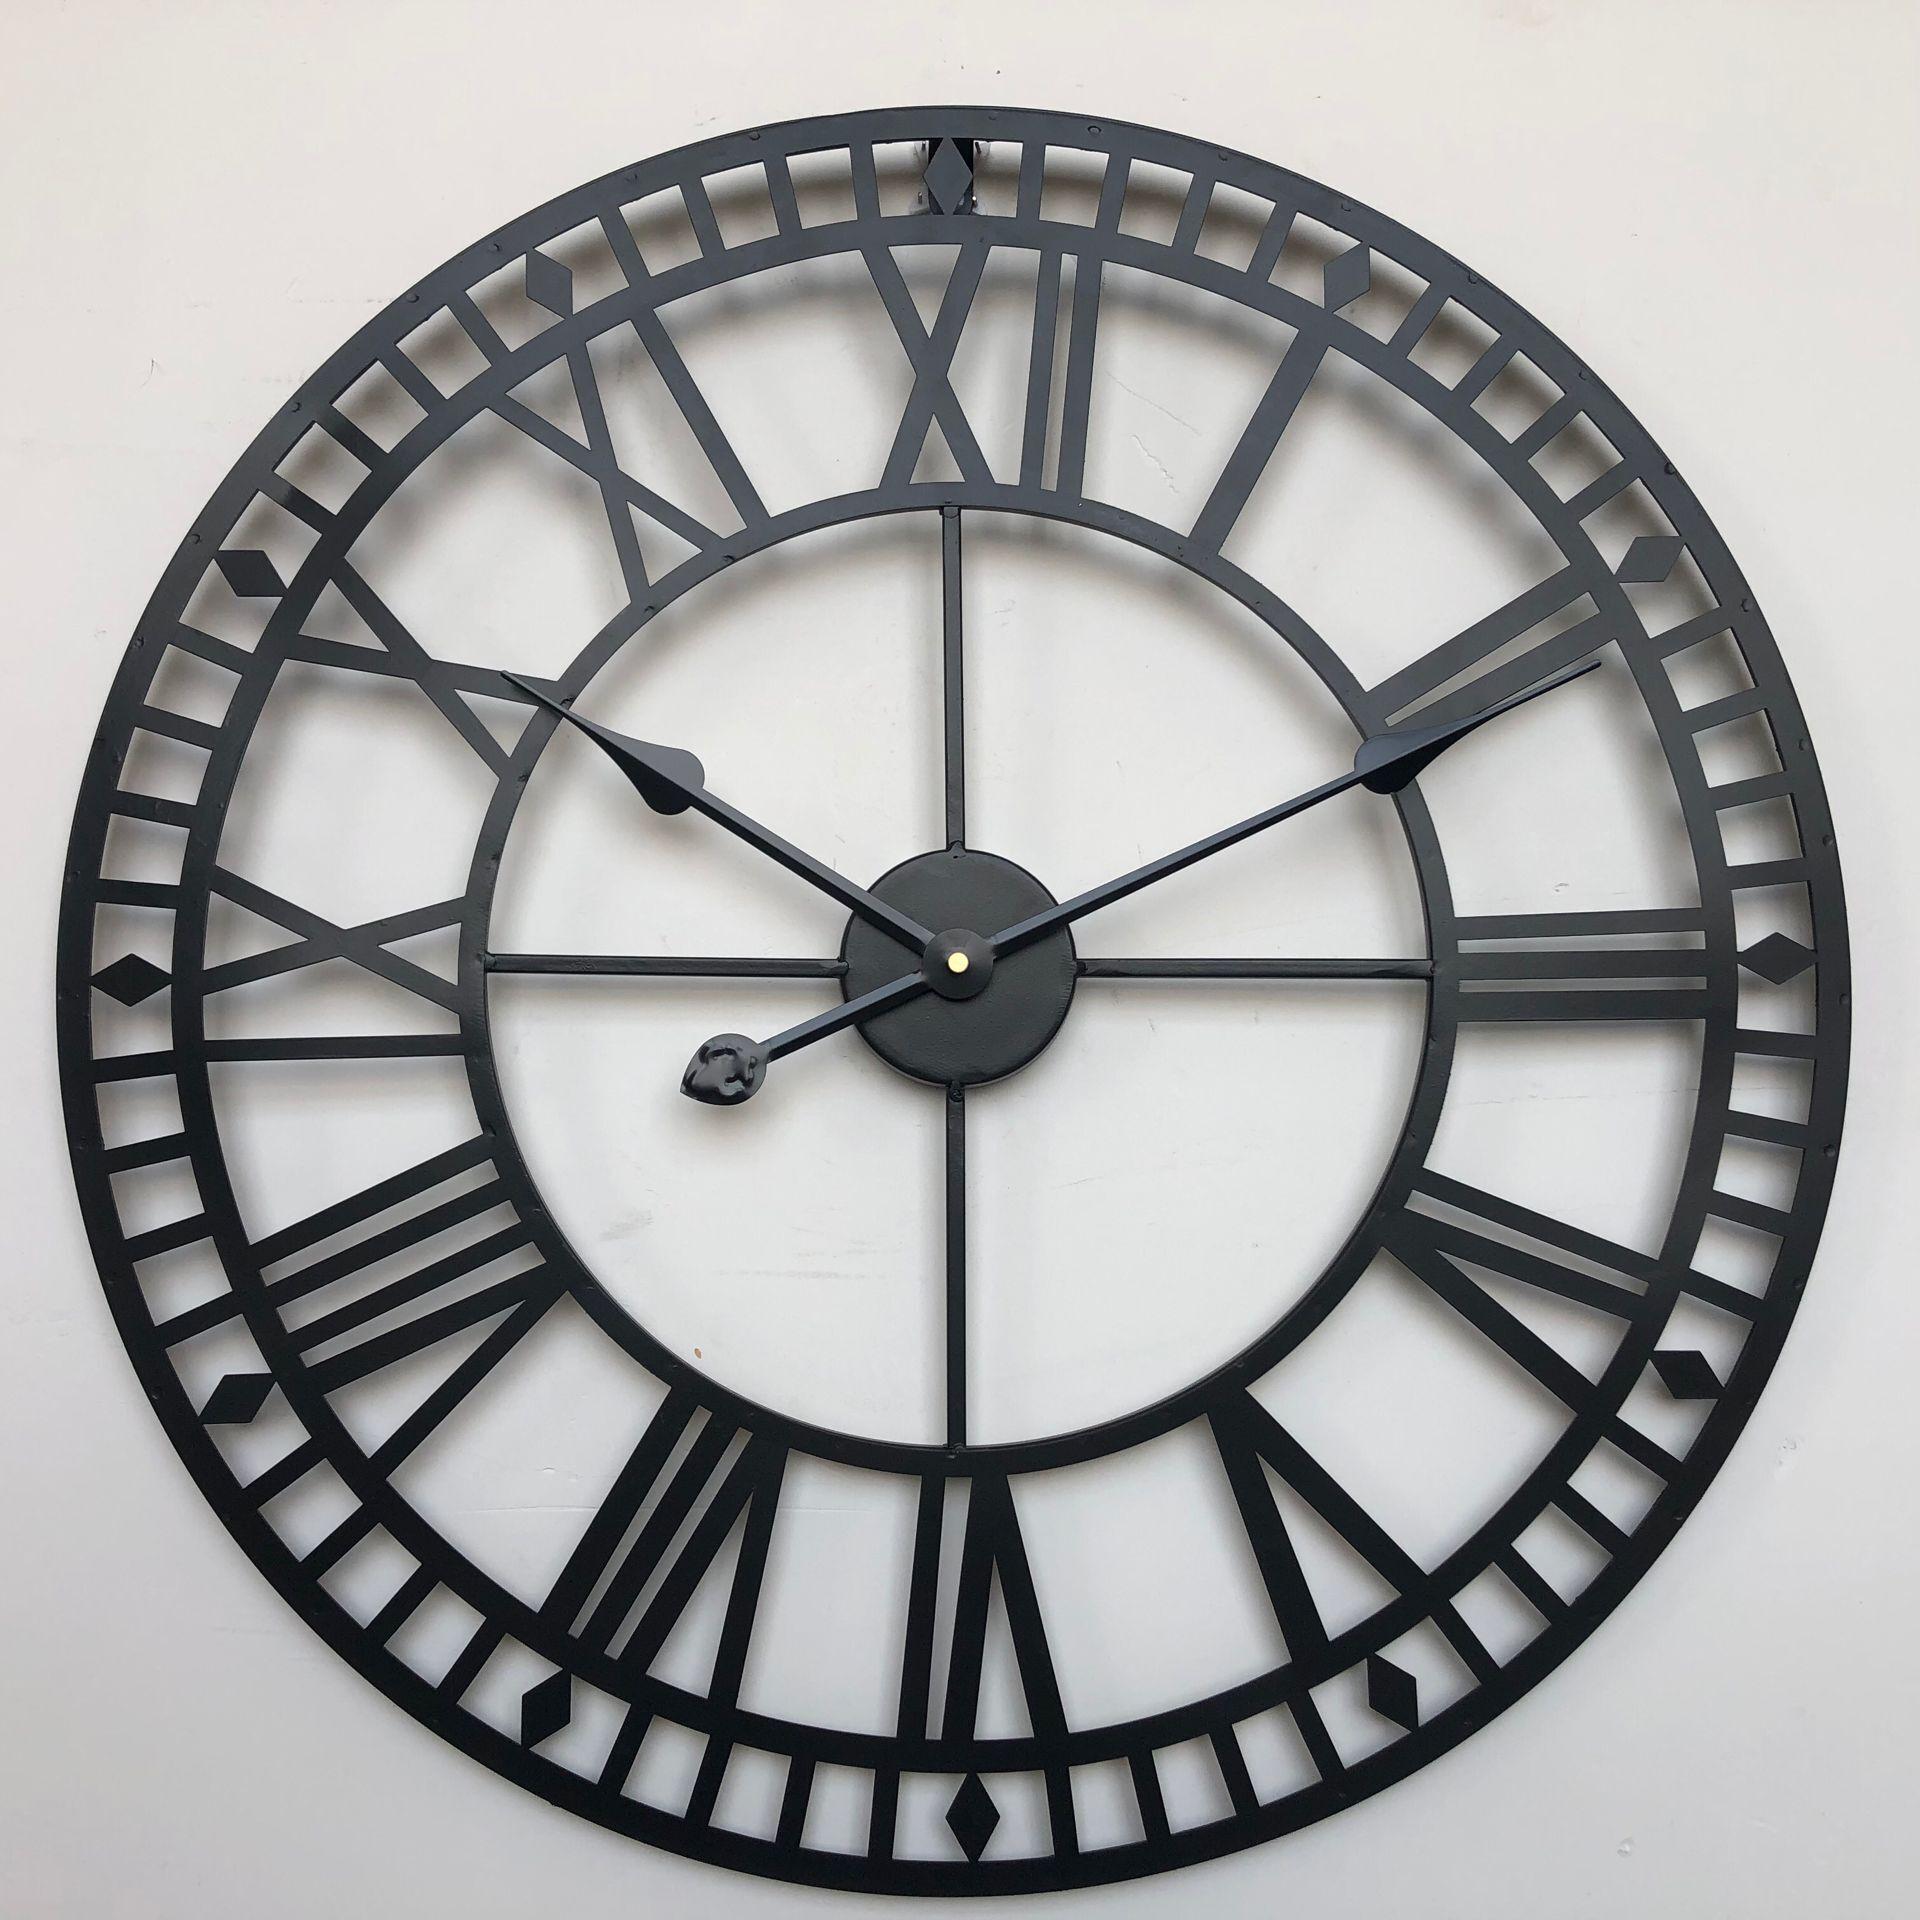 60cm European Large Roman Wrought Iron Wall Clock Modern Design Living Room Mute Decorative Round Quartz Clock Clock On The Wall